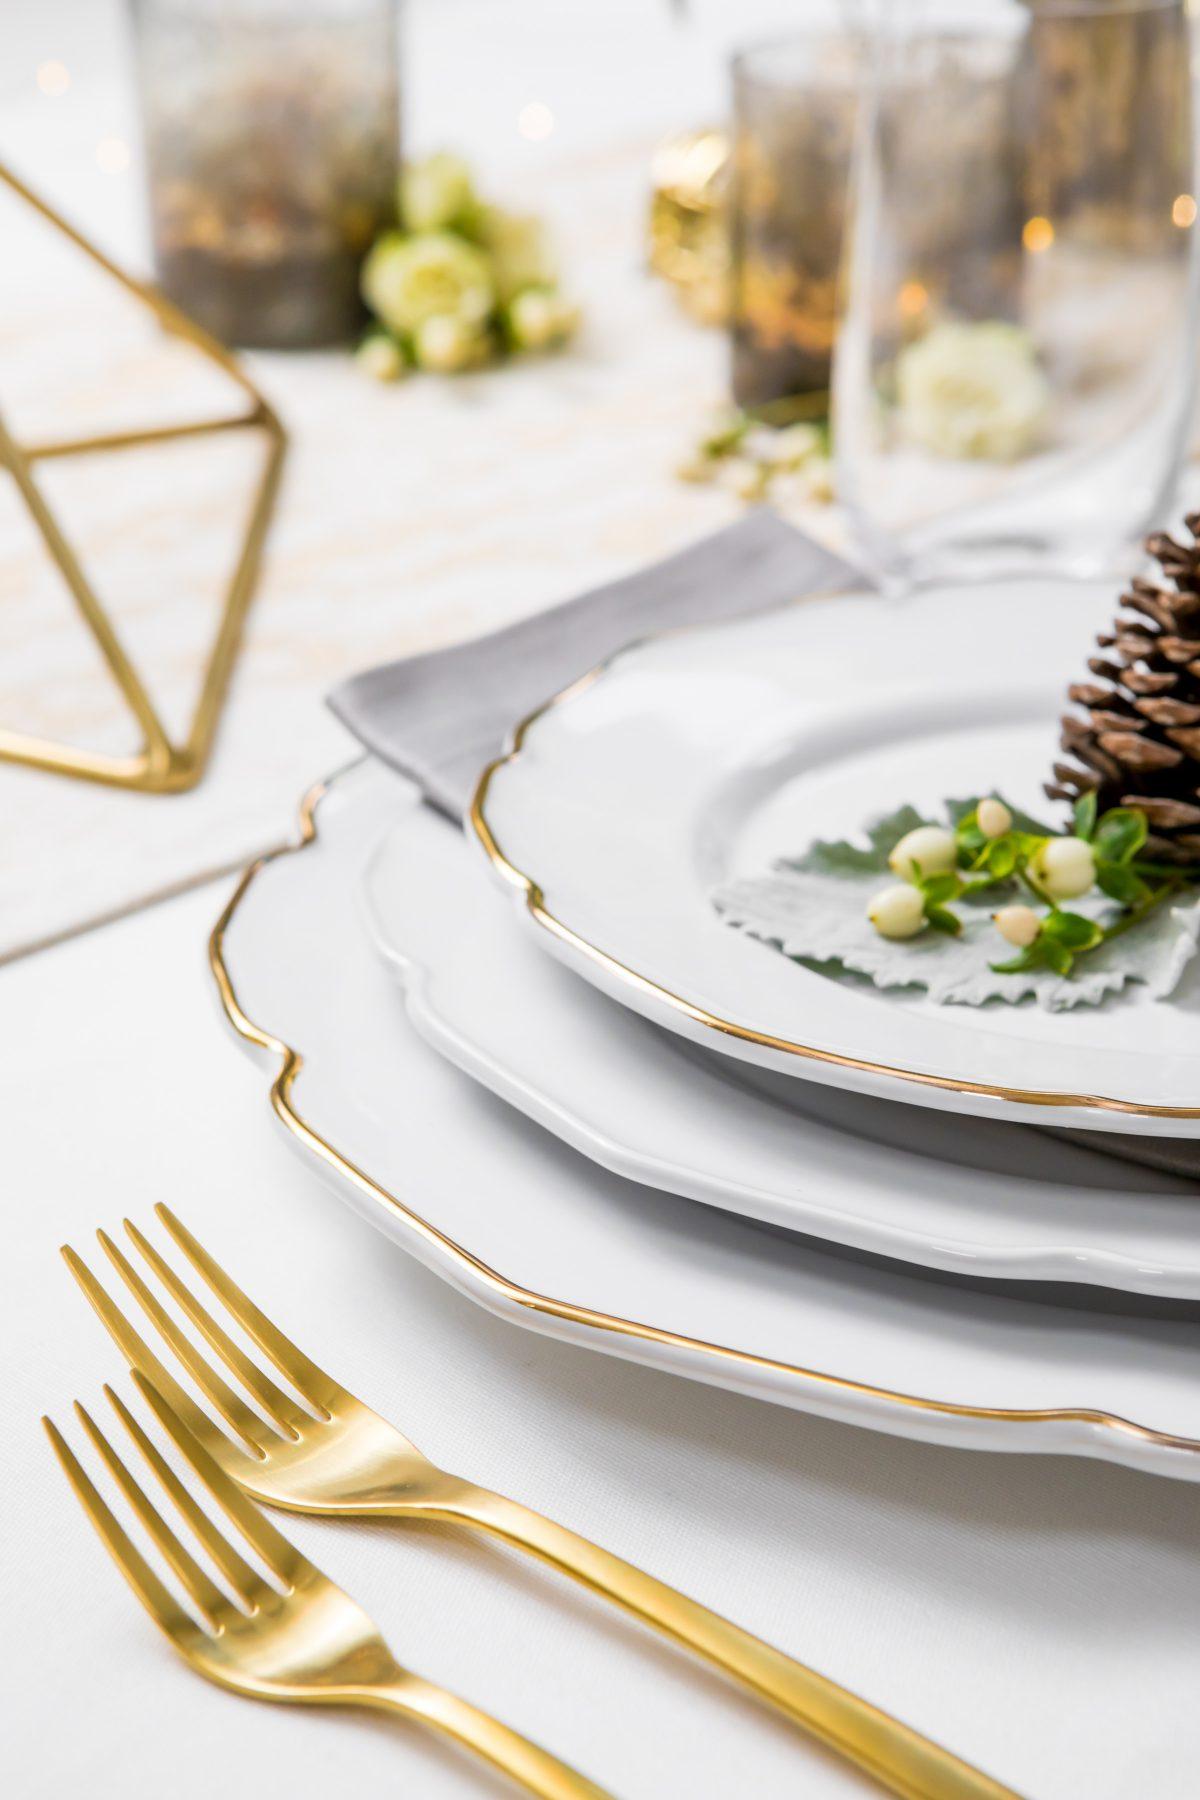 5D4B3865 - Tablescapes - Christmas-mix-your-metals